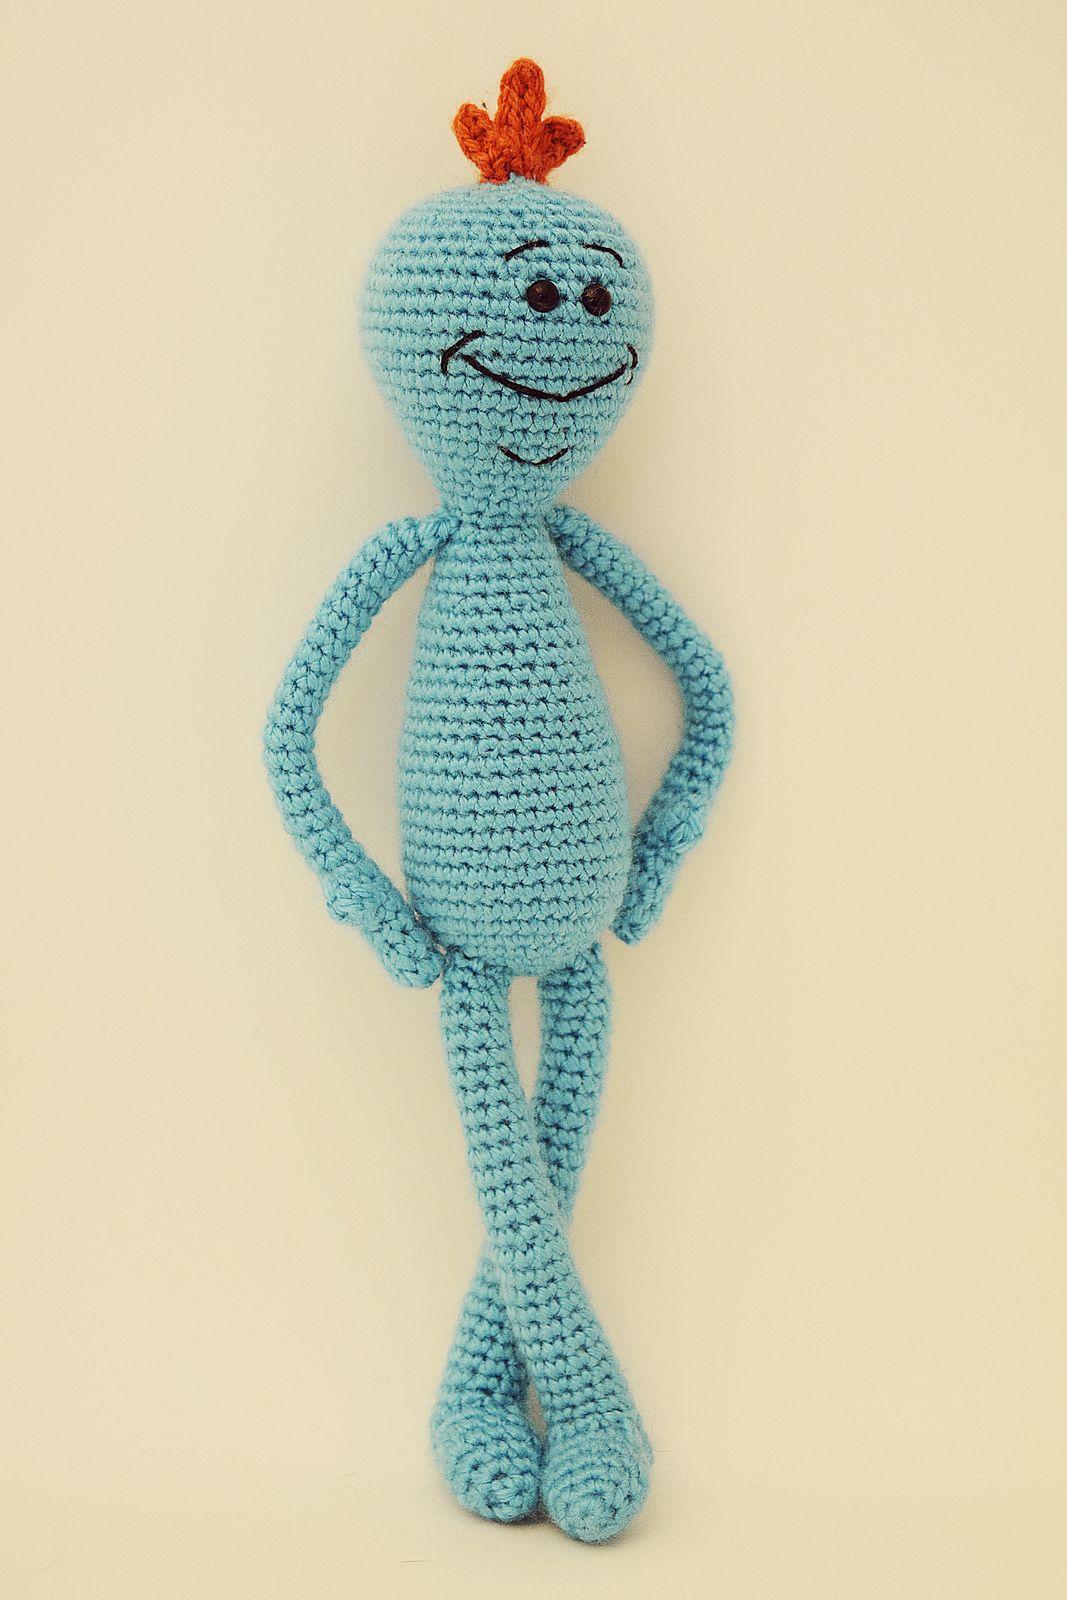 rick and morty crochet ile ilgili görsel sonucu   Crochet coasters ...   1600x1067